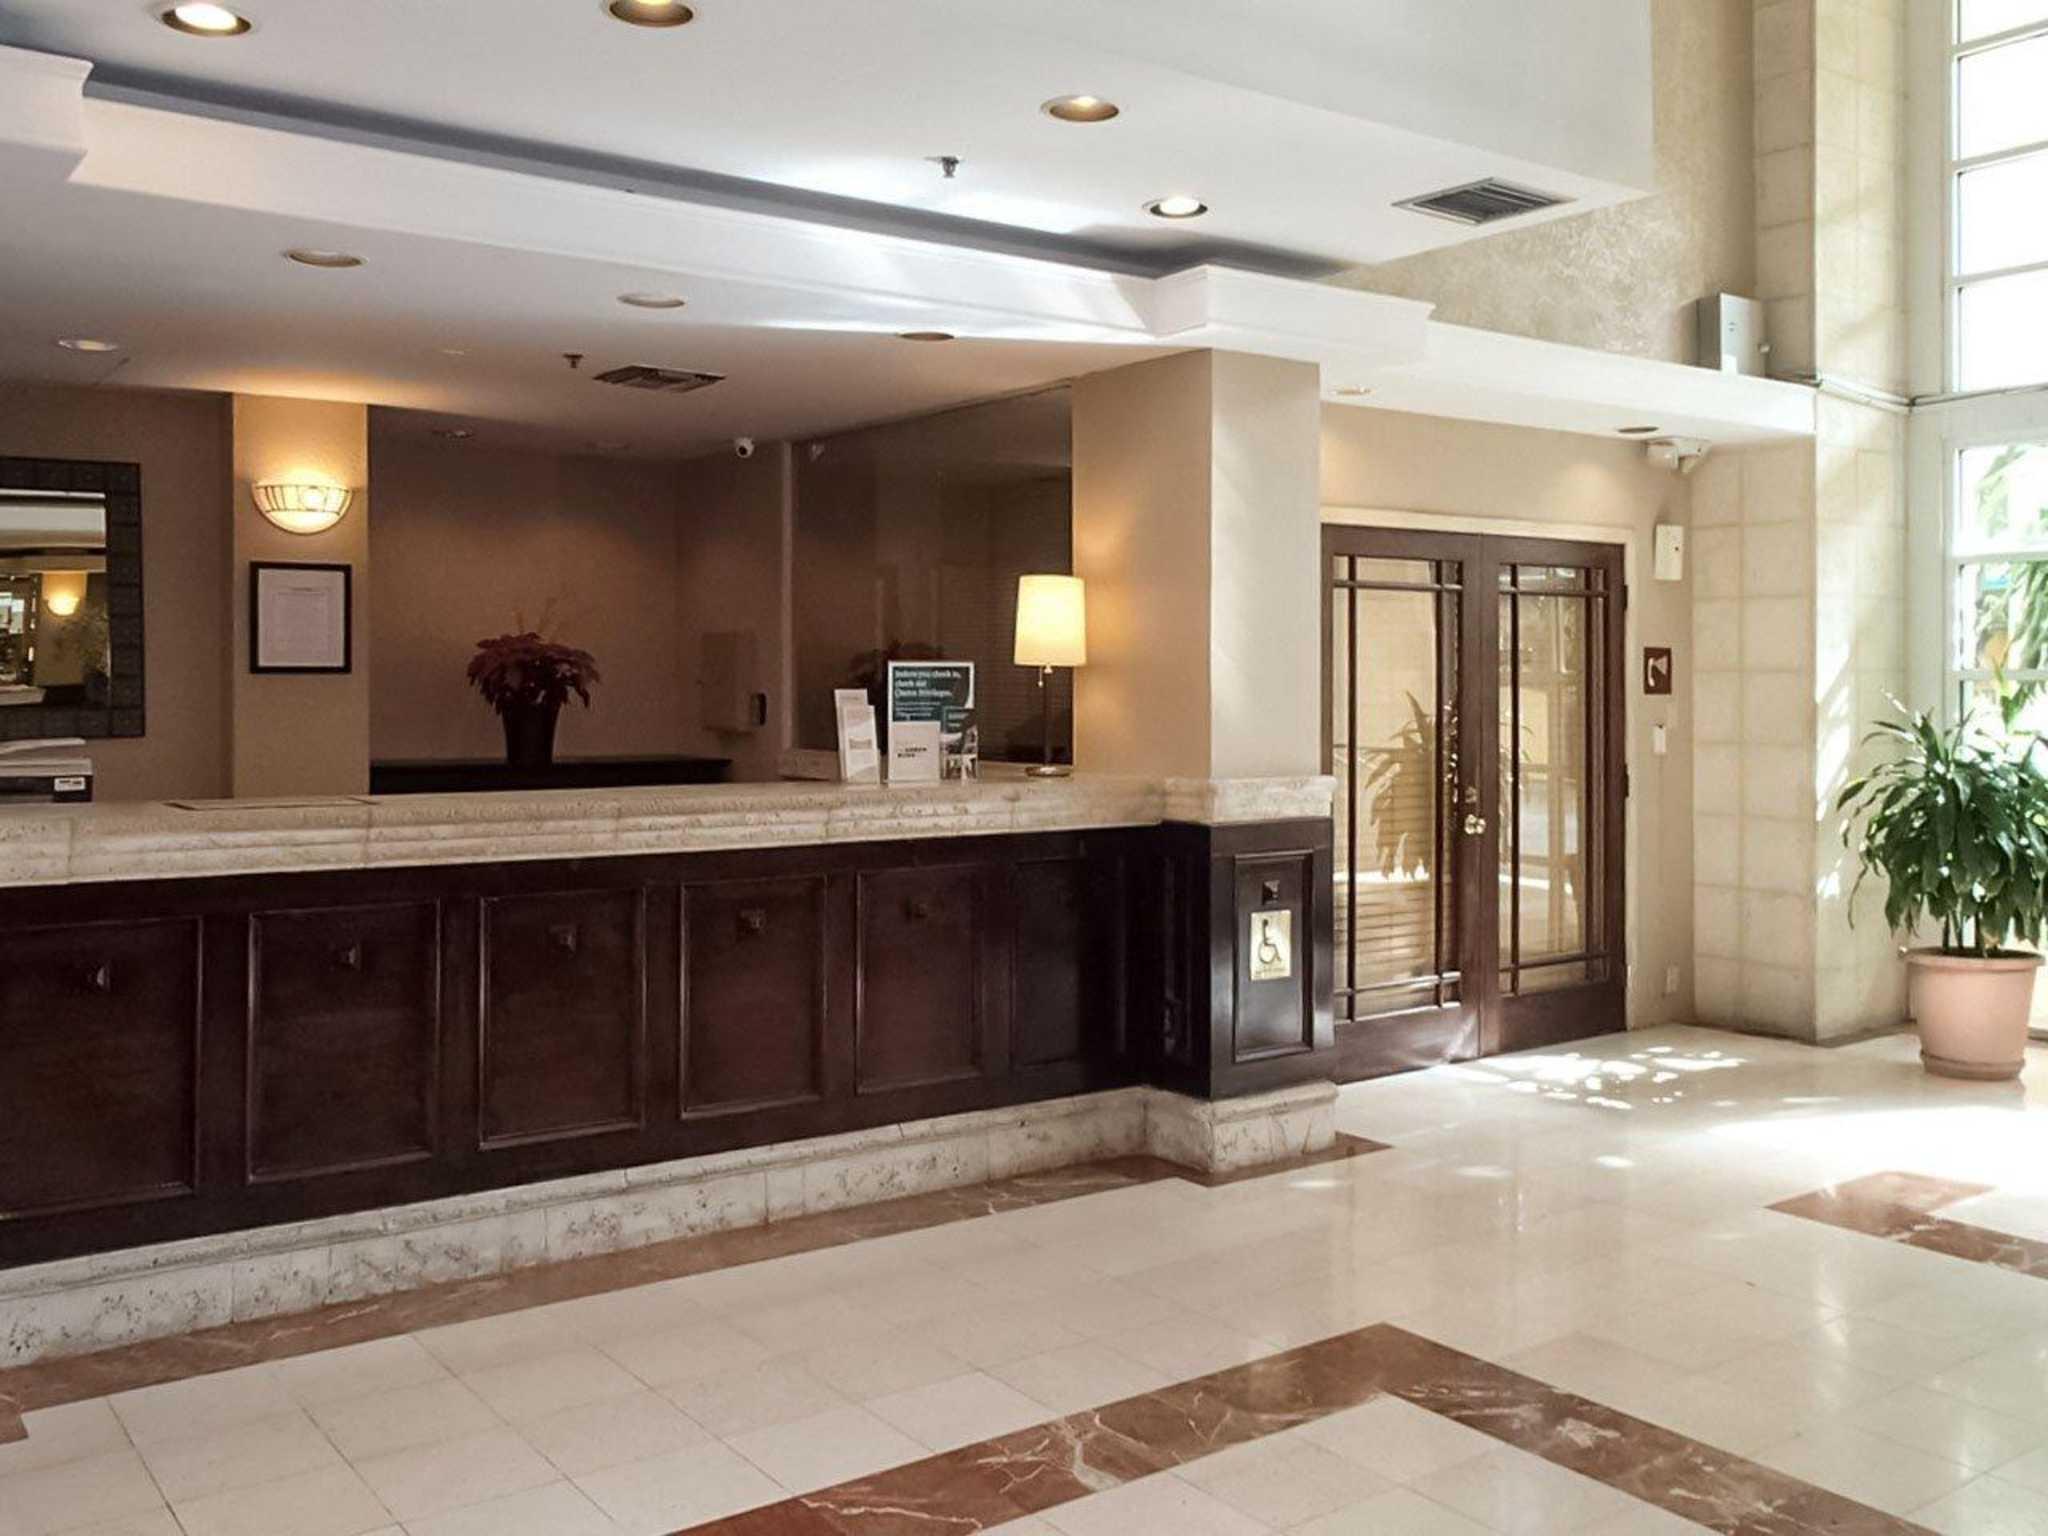 Rodeway Inn South Miami - Coral Gables image 10